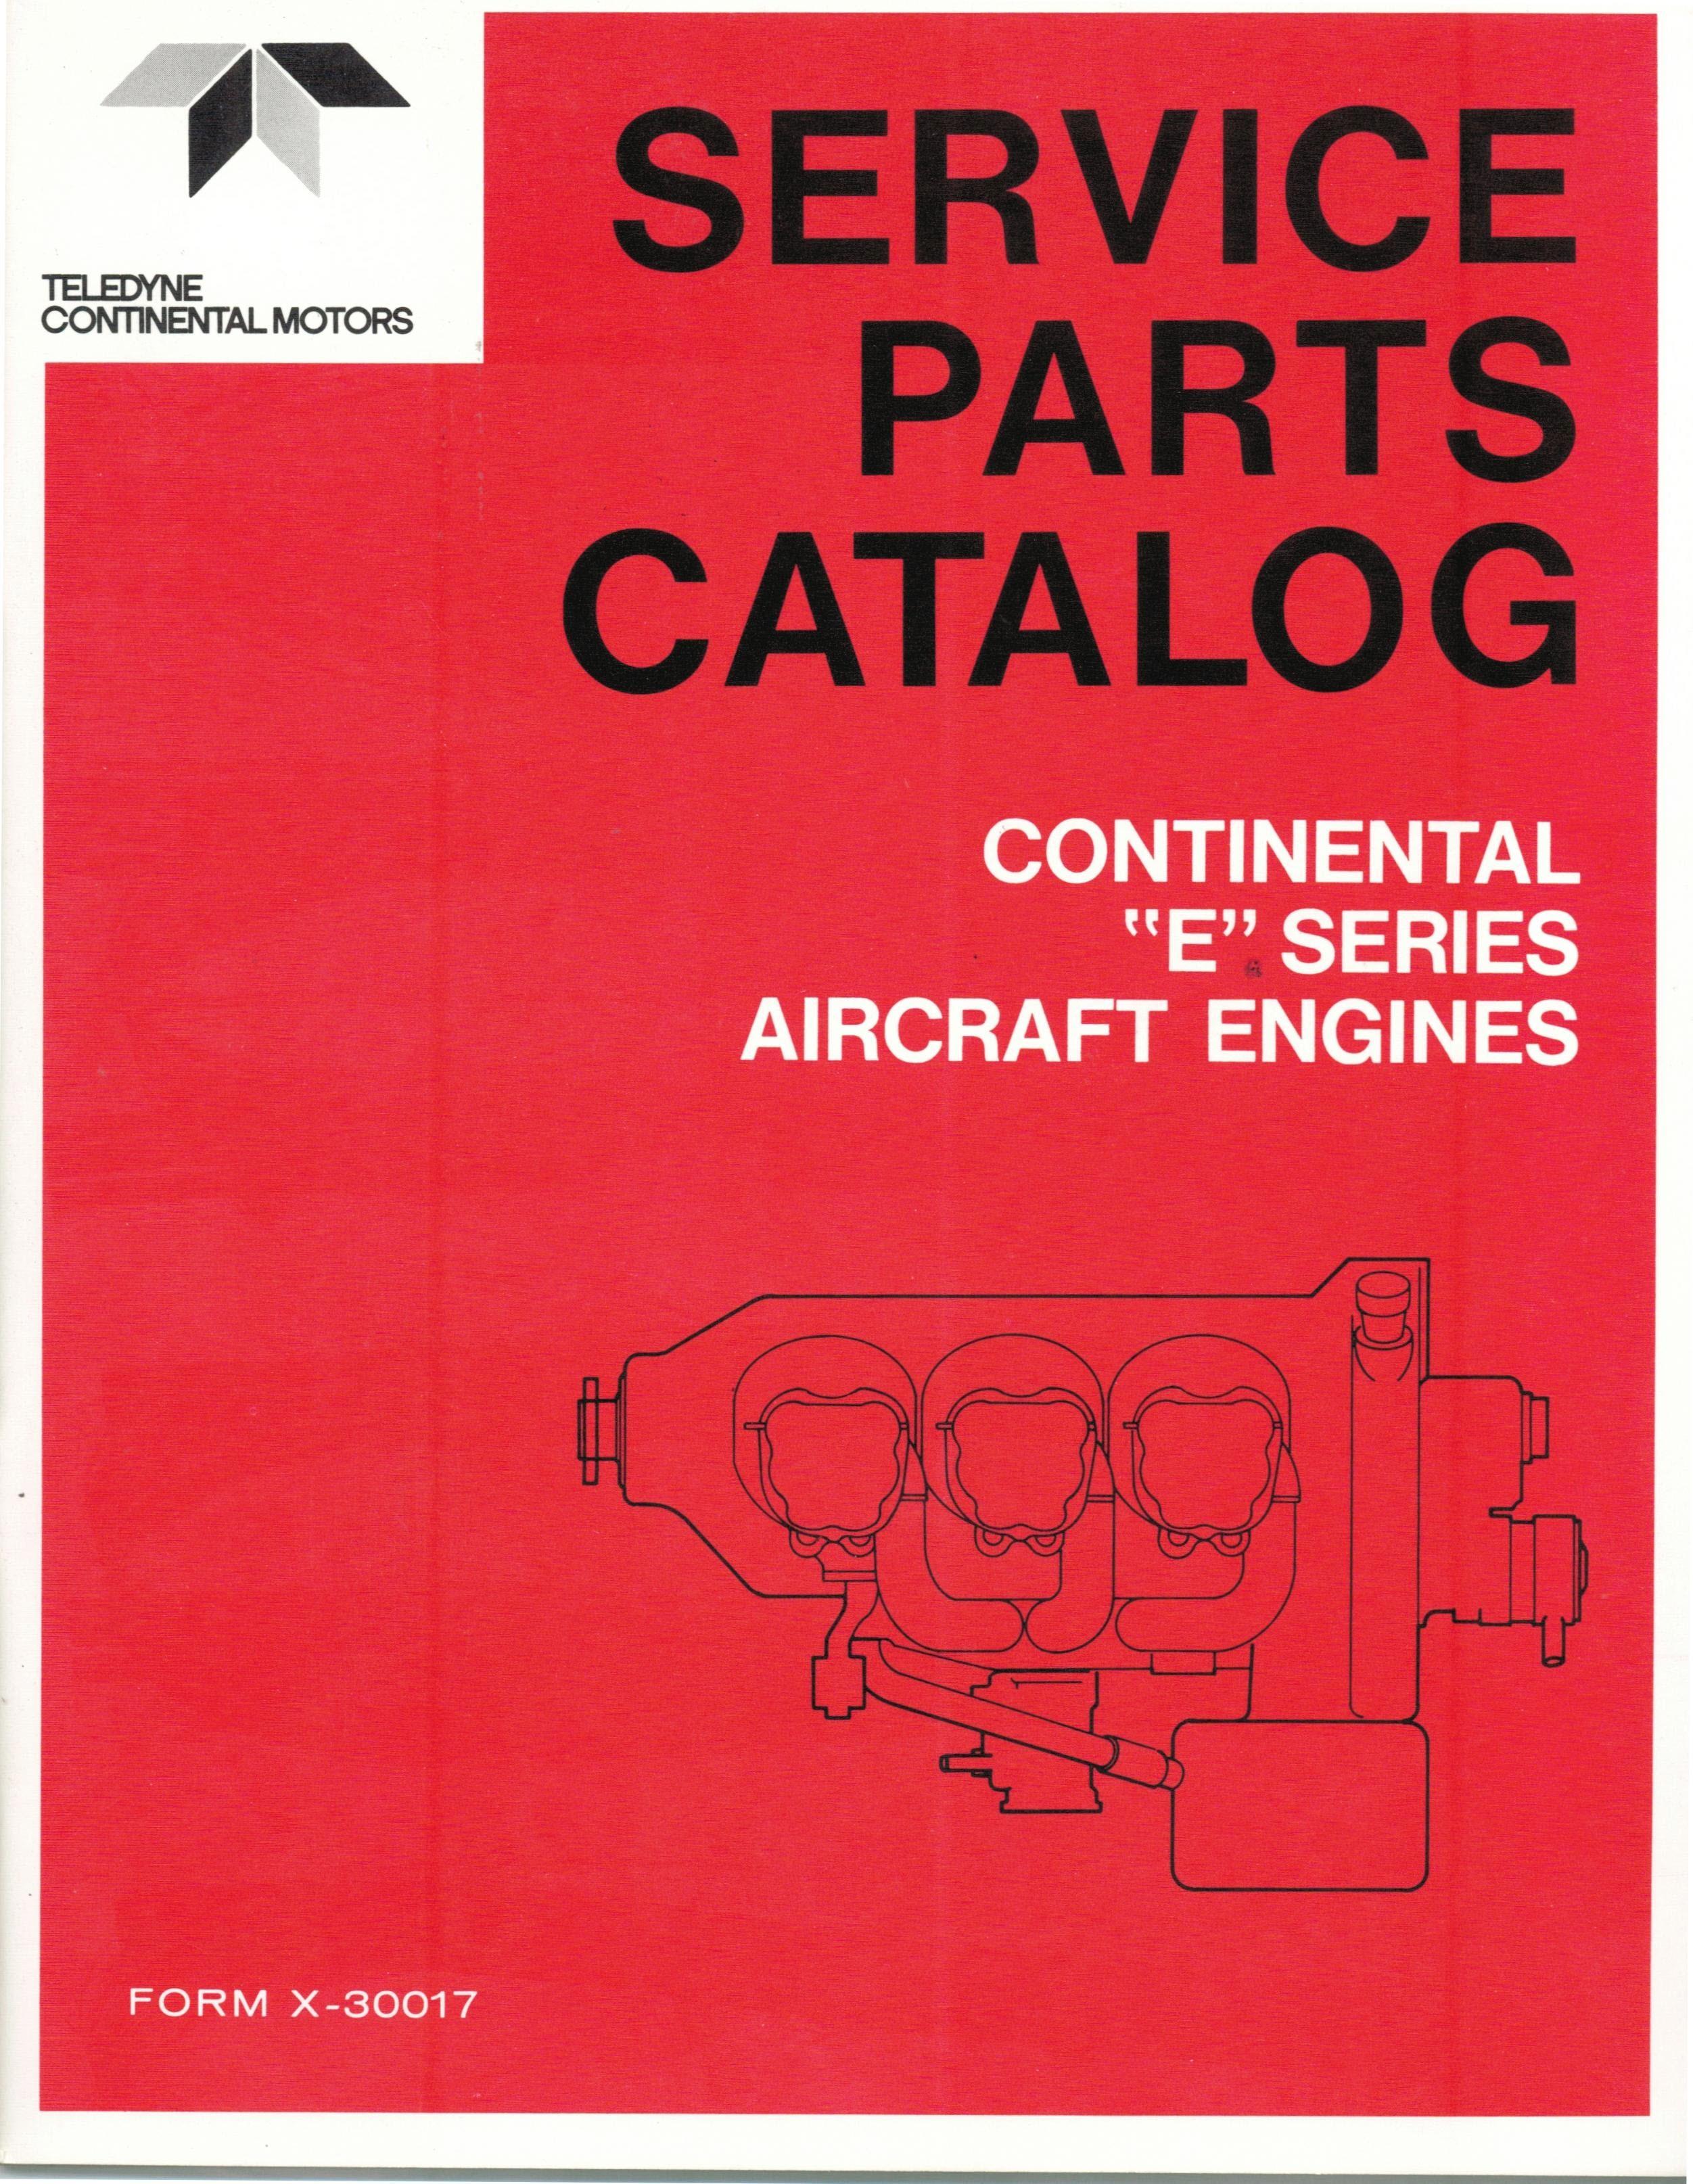 X-30017 Manual Parts Catalog - Fresno Airparts Co